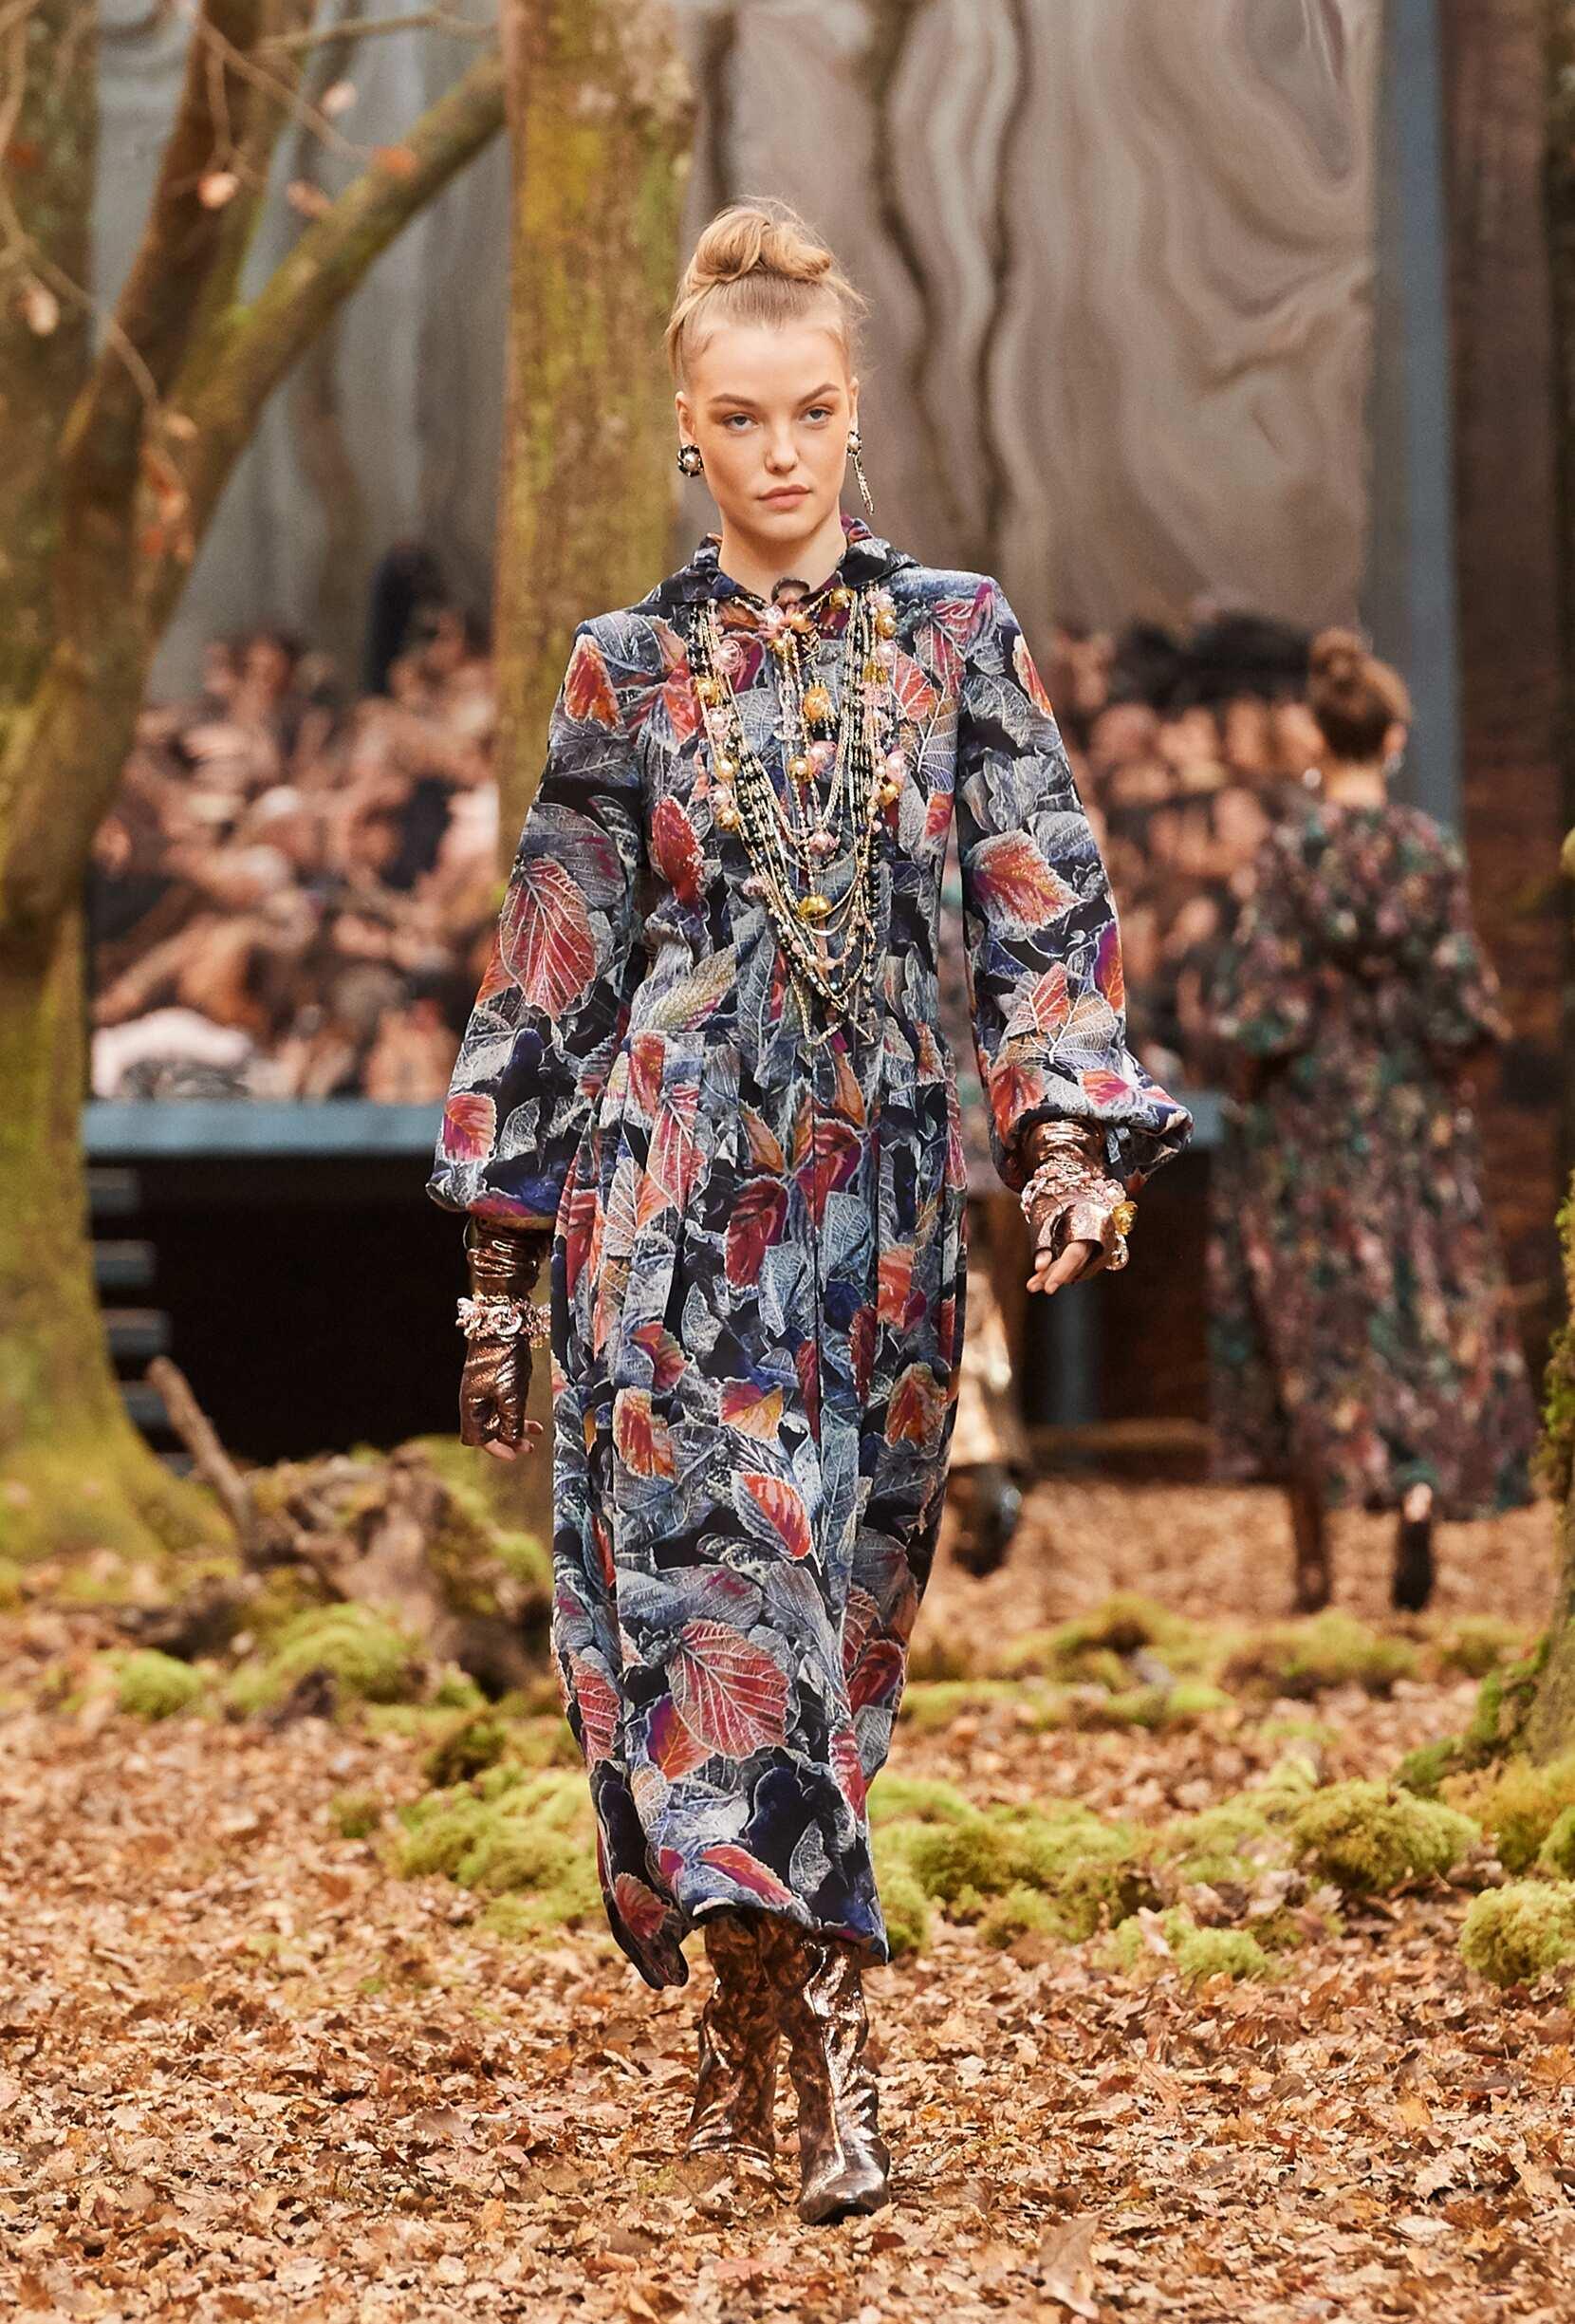 2018 Chanel Catwalk Paris Fashion Week